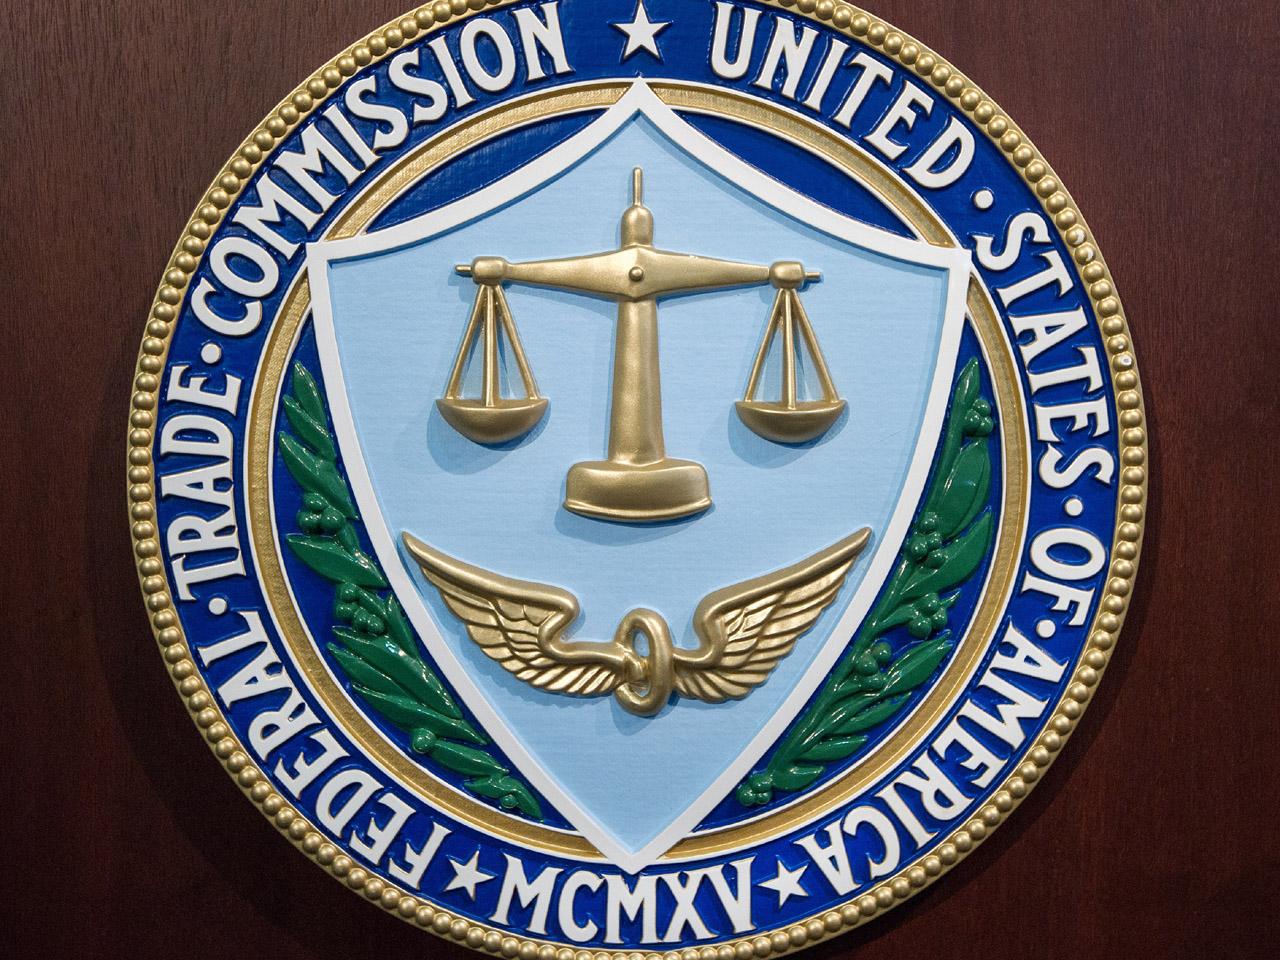 FTC hits LifeLock again, with $100 million penalty - CBS News